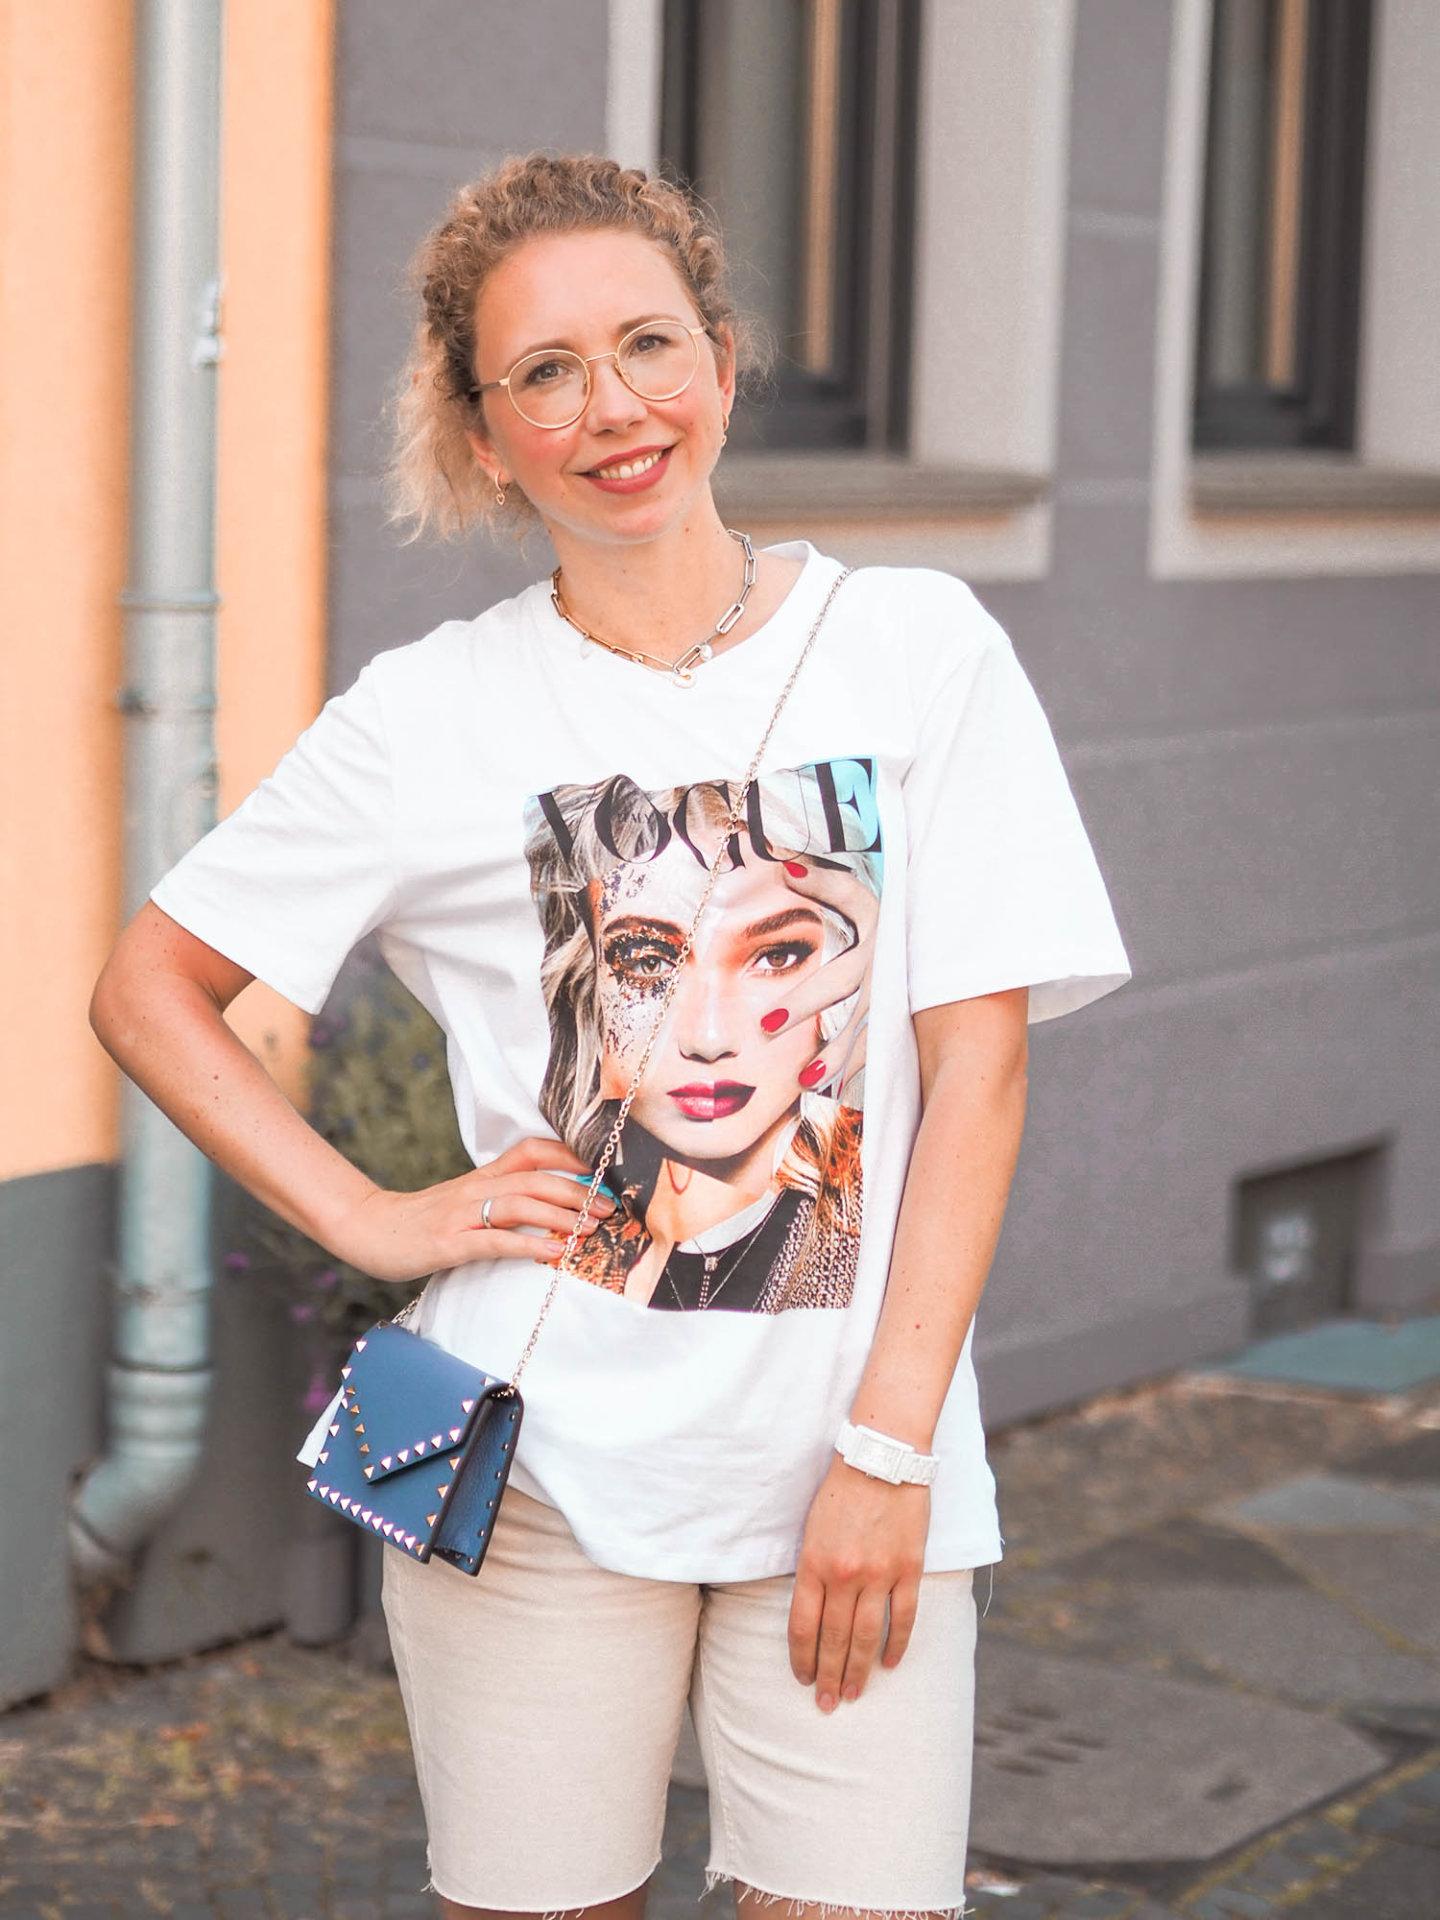 Fashiontrend VOGUE T-Shirt